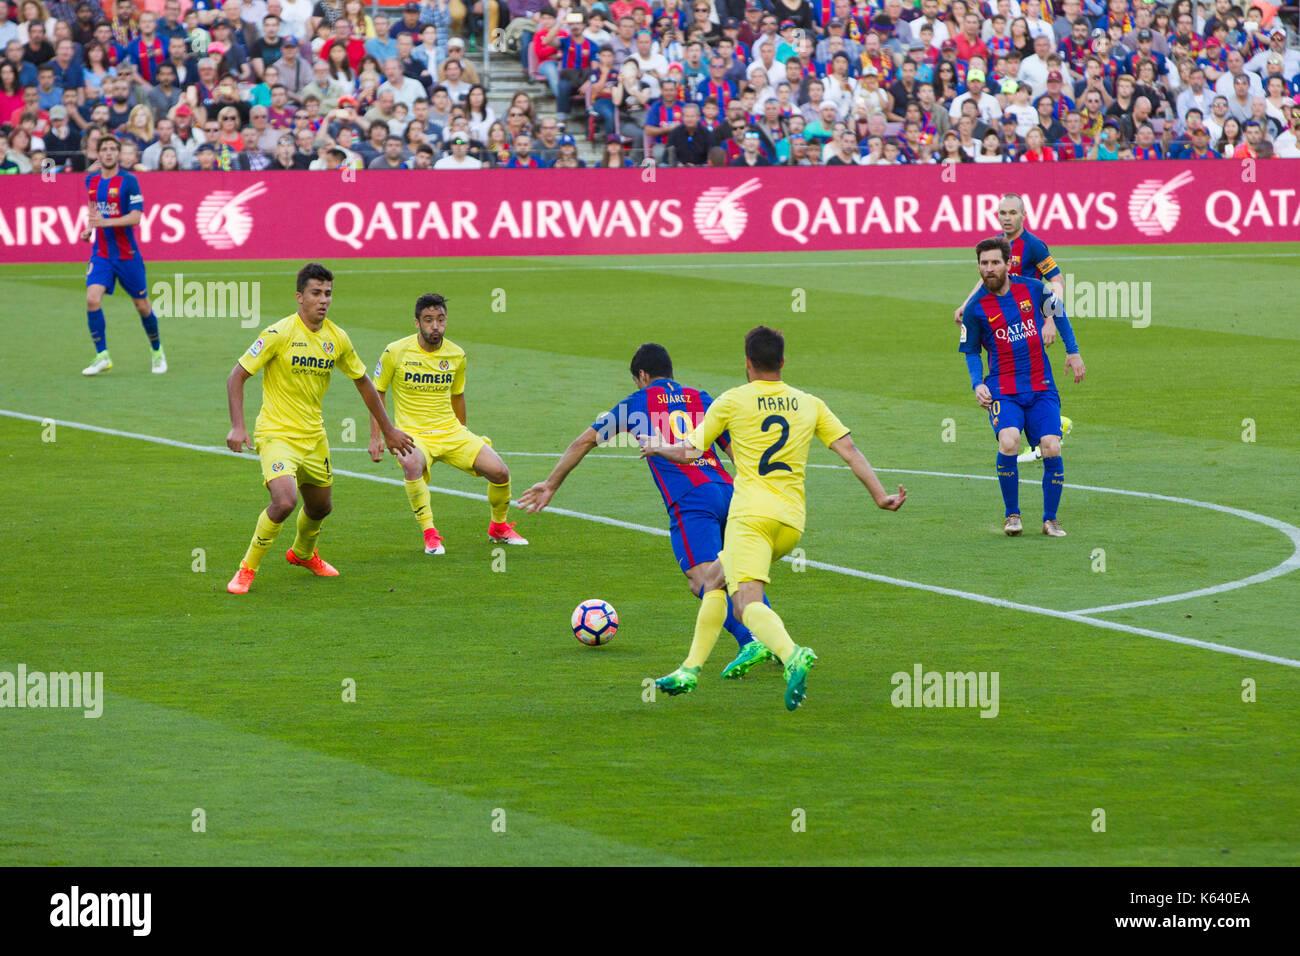 Luis Suarez in possession of ball - 6/5/17 Barcelona v Villarreal football league match at the Camp Nou stadium, Barcelona. - Stock Image